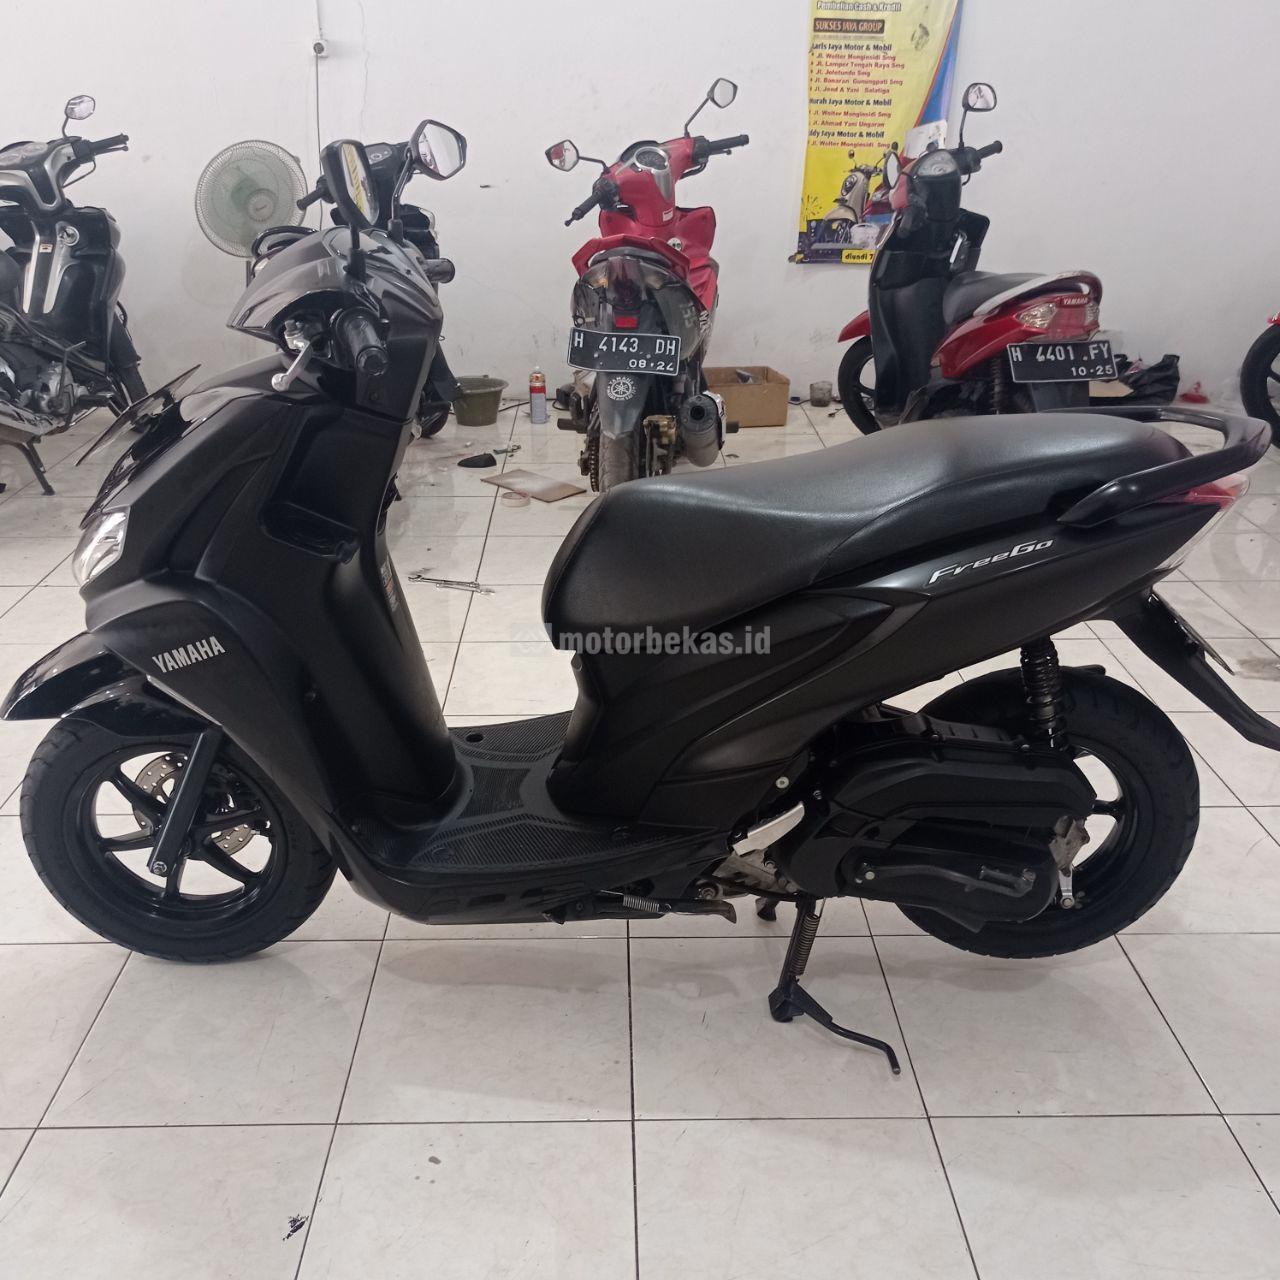 YAMAHA FREE GO  788 motorbekas.id